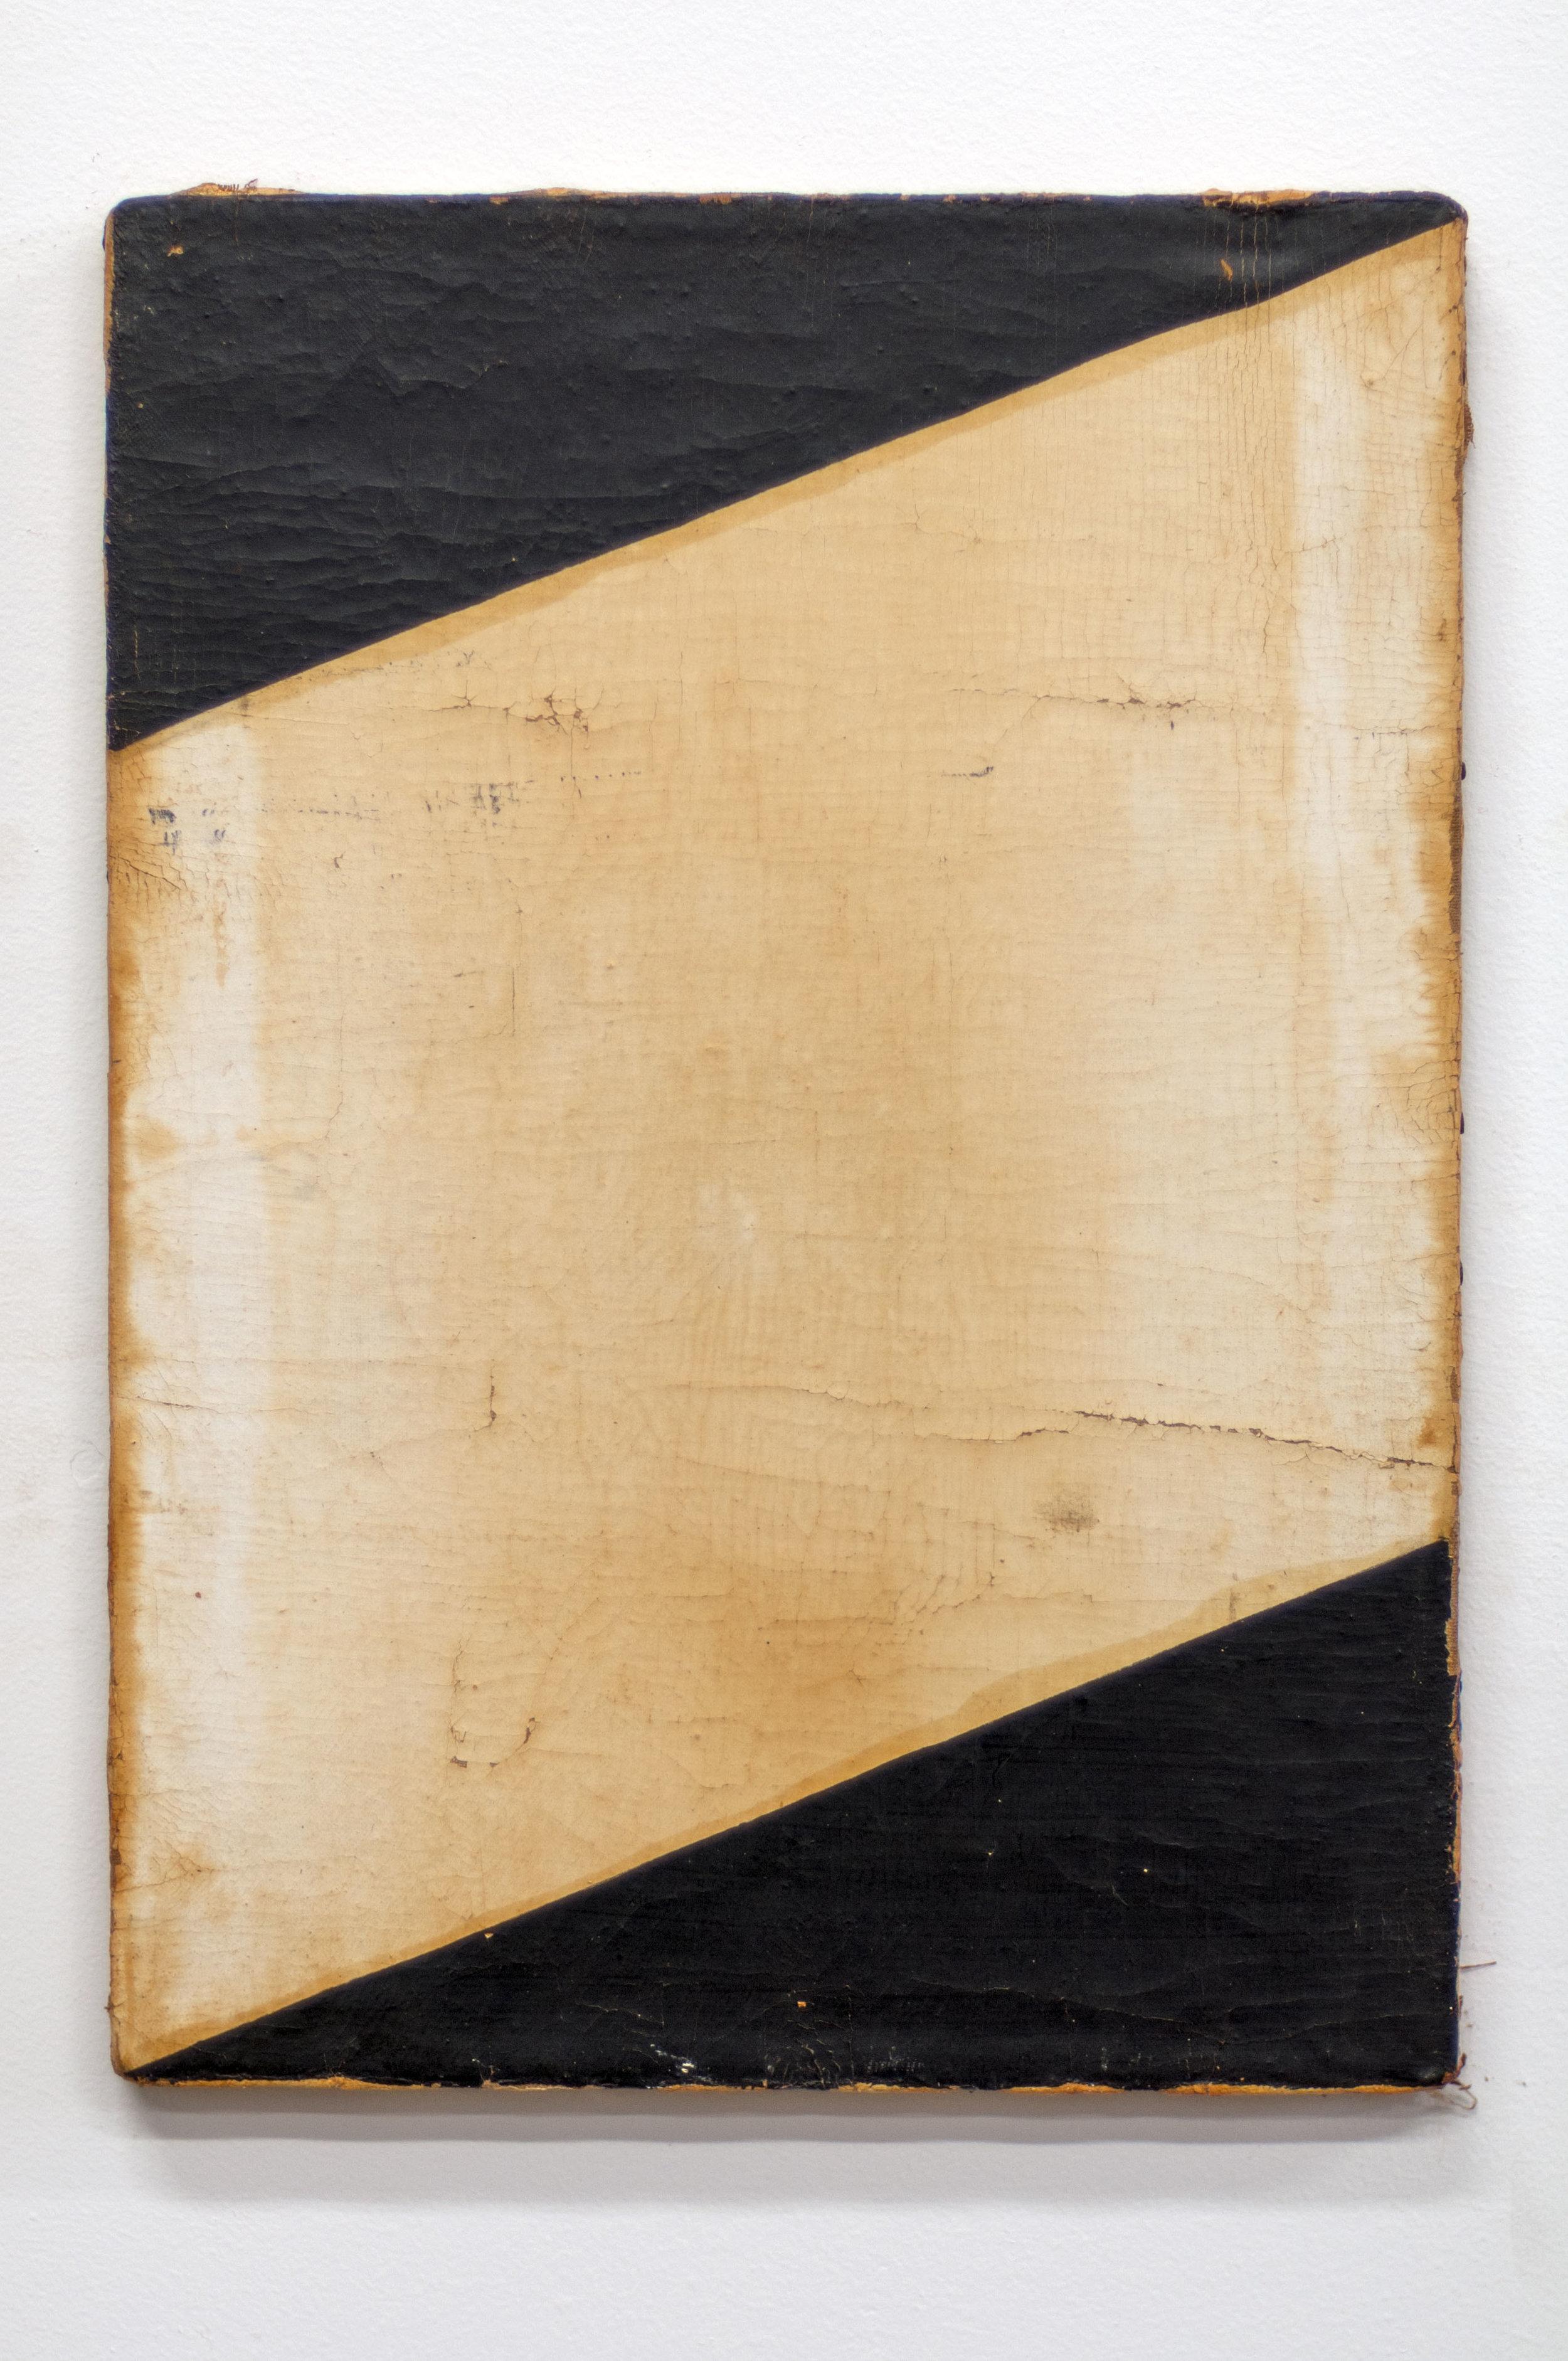 Blaise Gimpert, 2016 oil on linen 42 x 28 cm - 16 1/2 x 11 inches